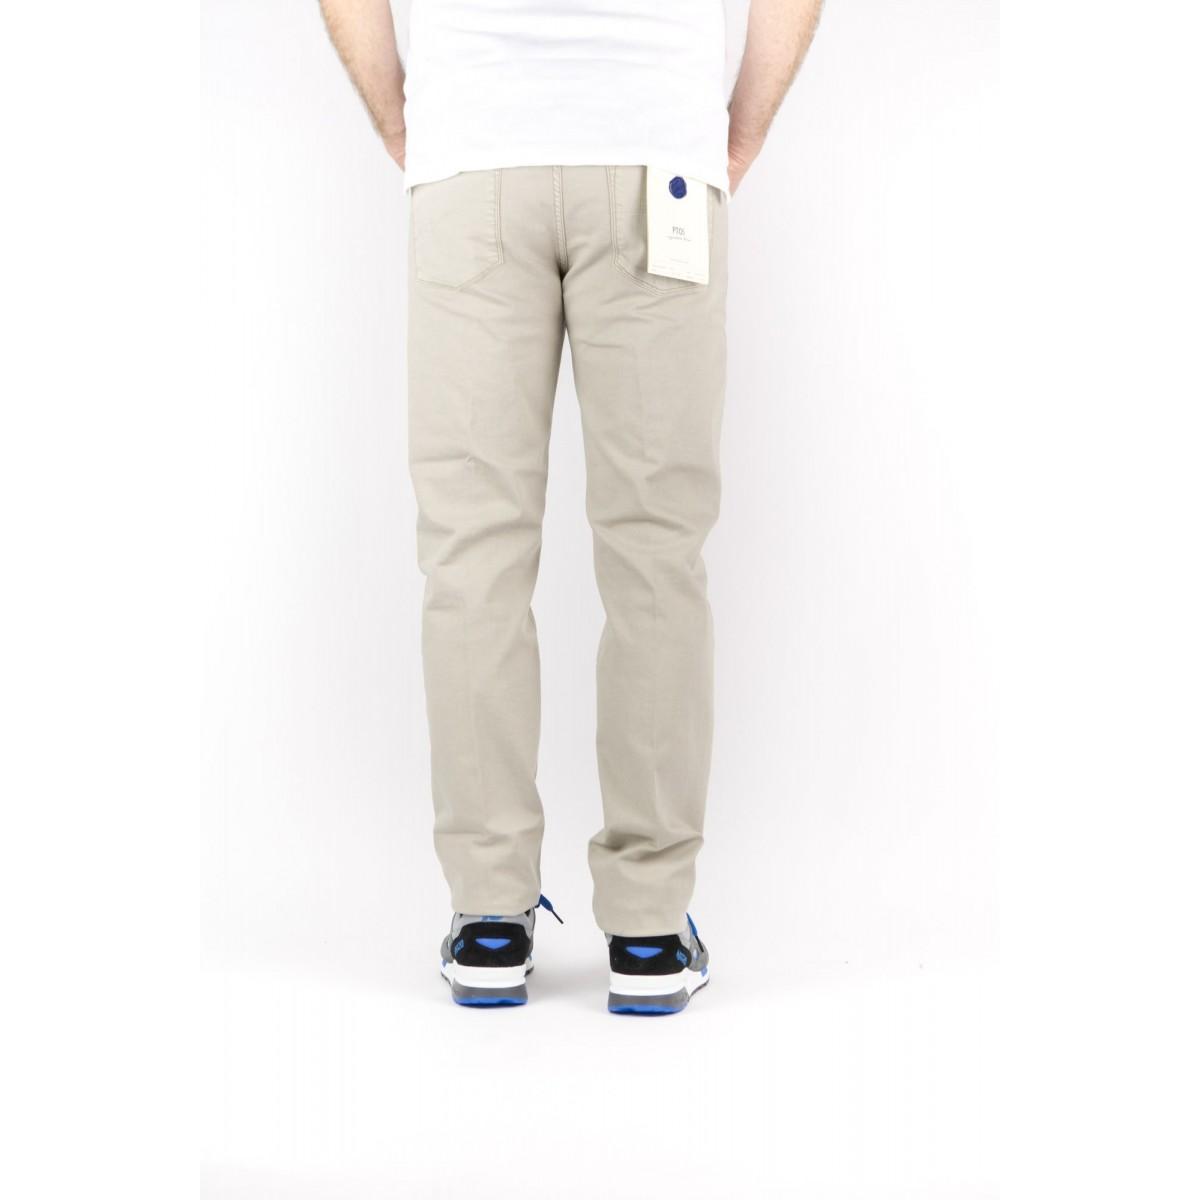 Jeans PT 01 Man - C6P5K5 Jeans Bull Di Cotone 5 Tasche Slim